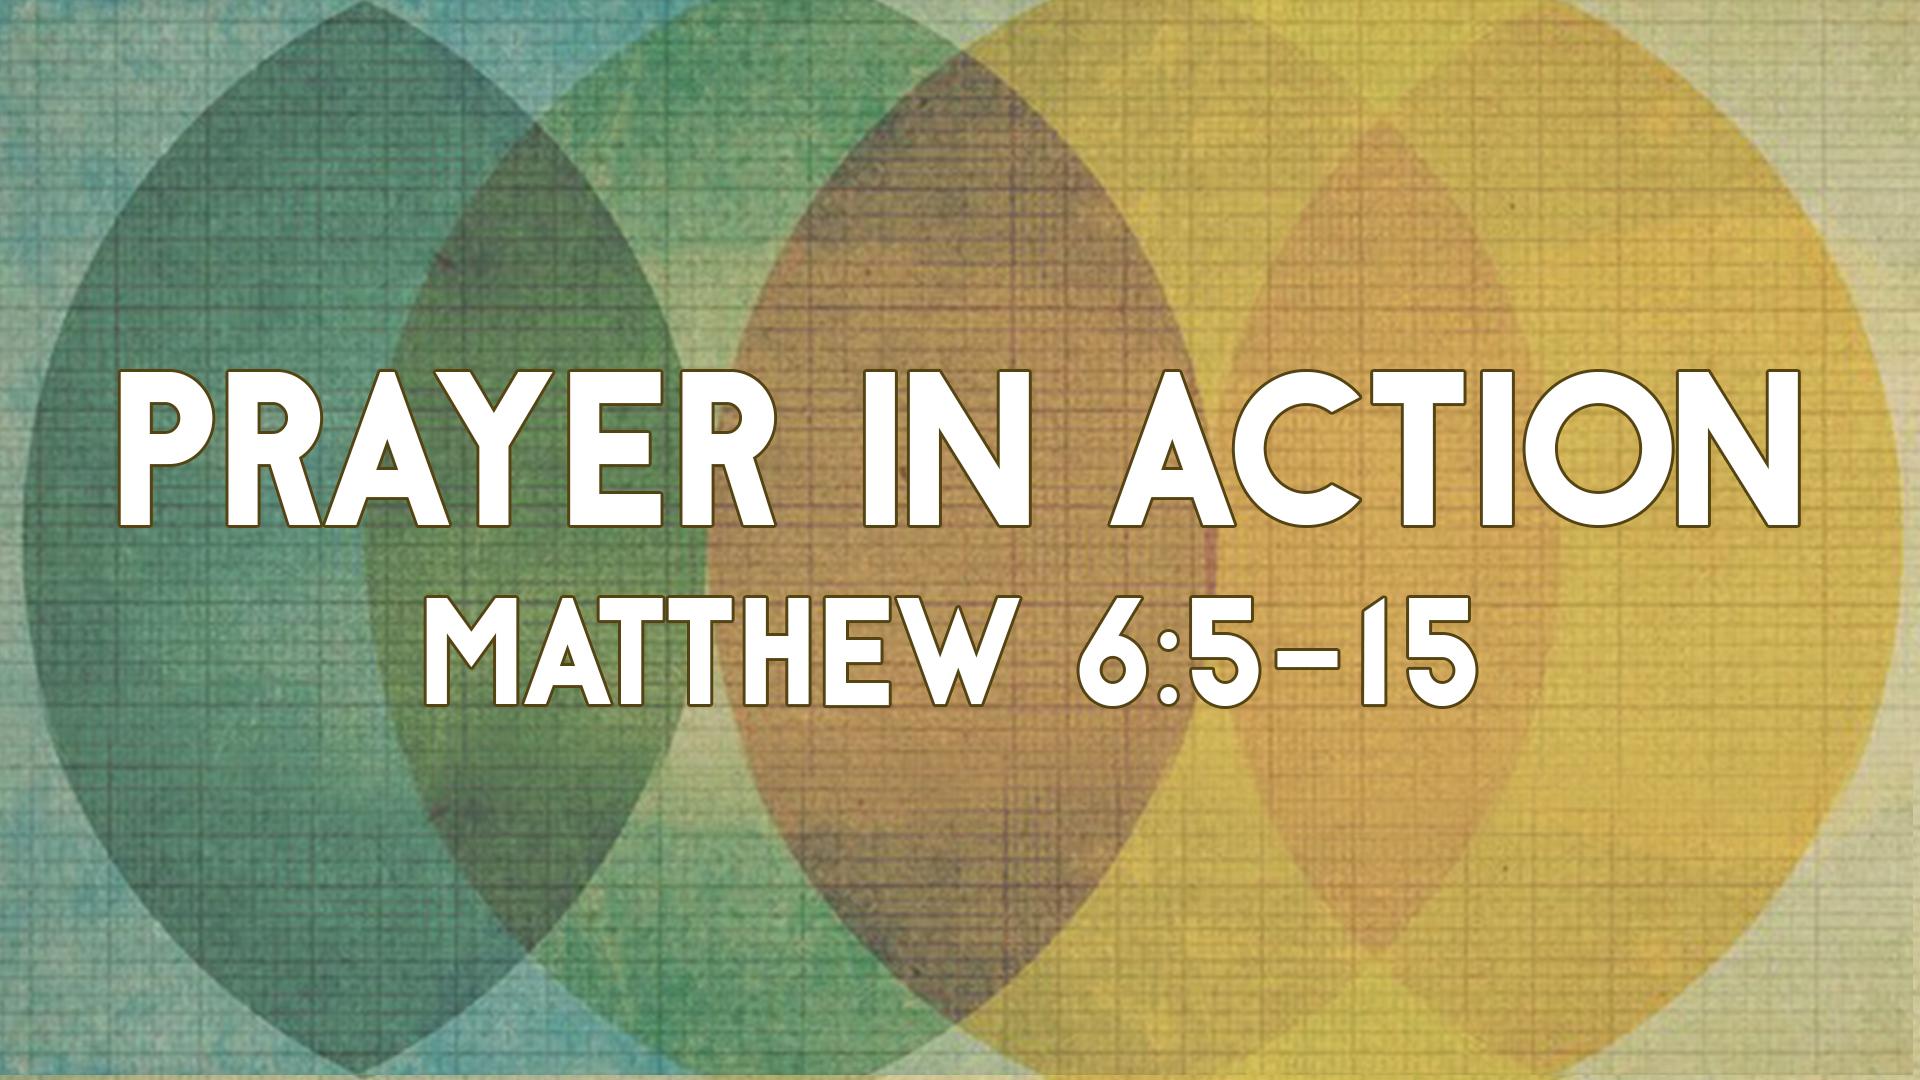 2017.01.09_PrayerInActionTitle.jpg